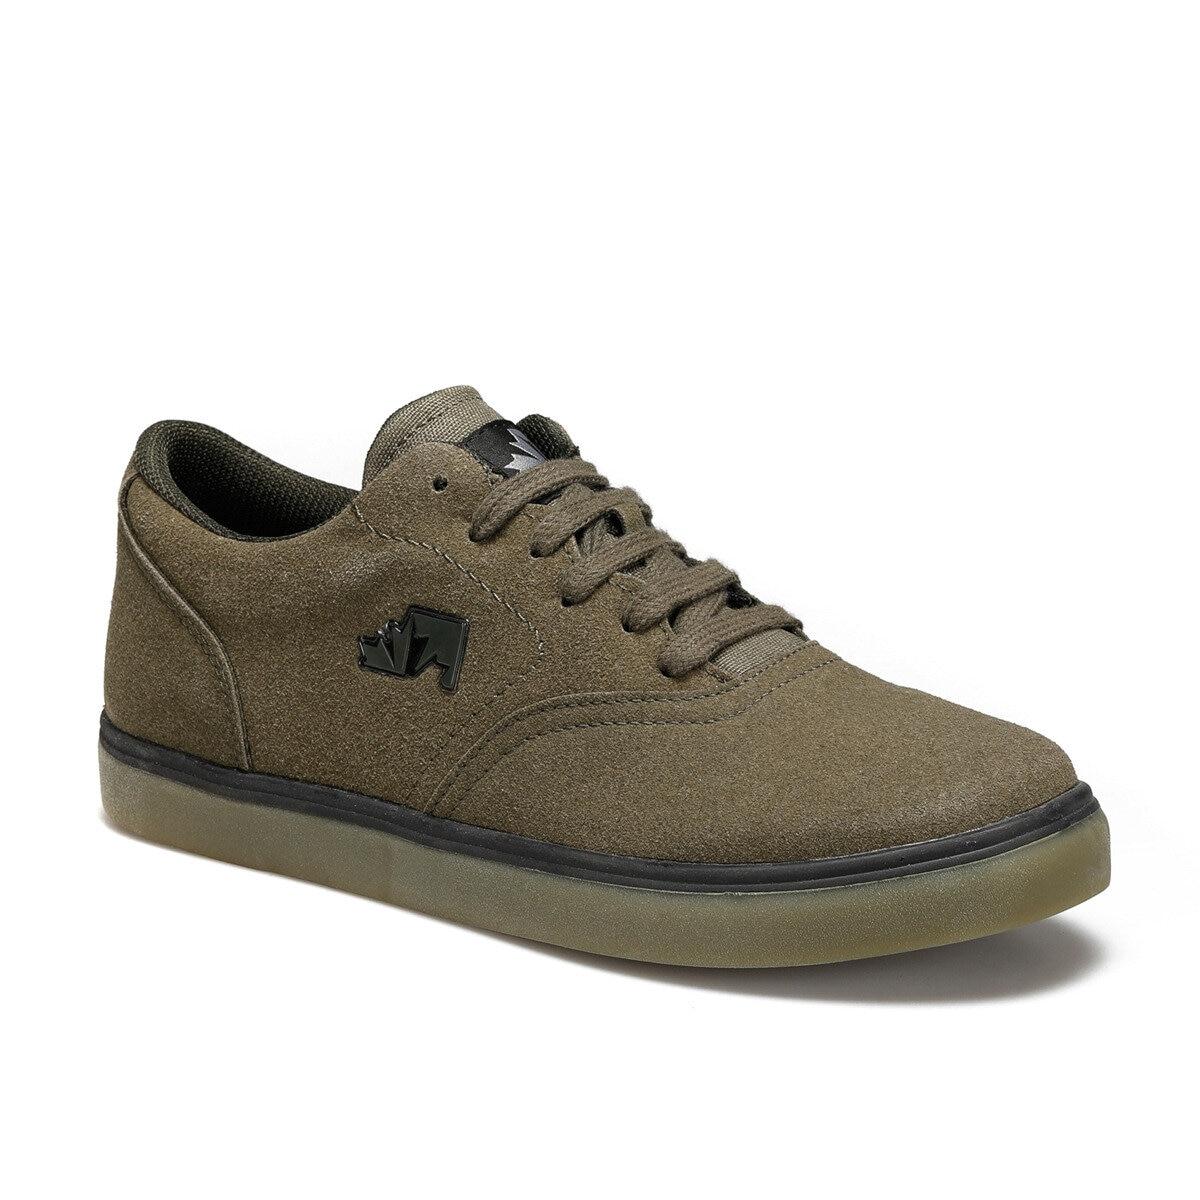 FLO RONAS 9PR Khaki Men 'S Sneaker Shoes LUMBERJACK